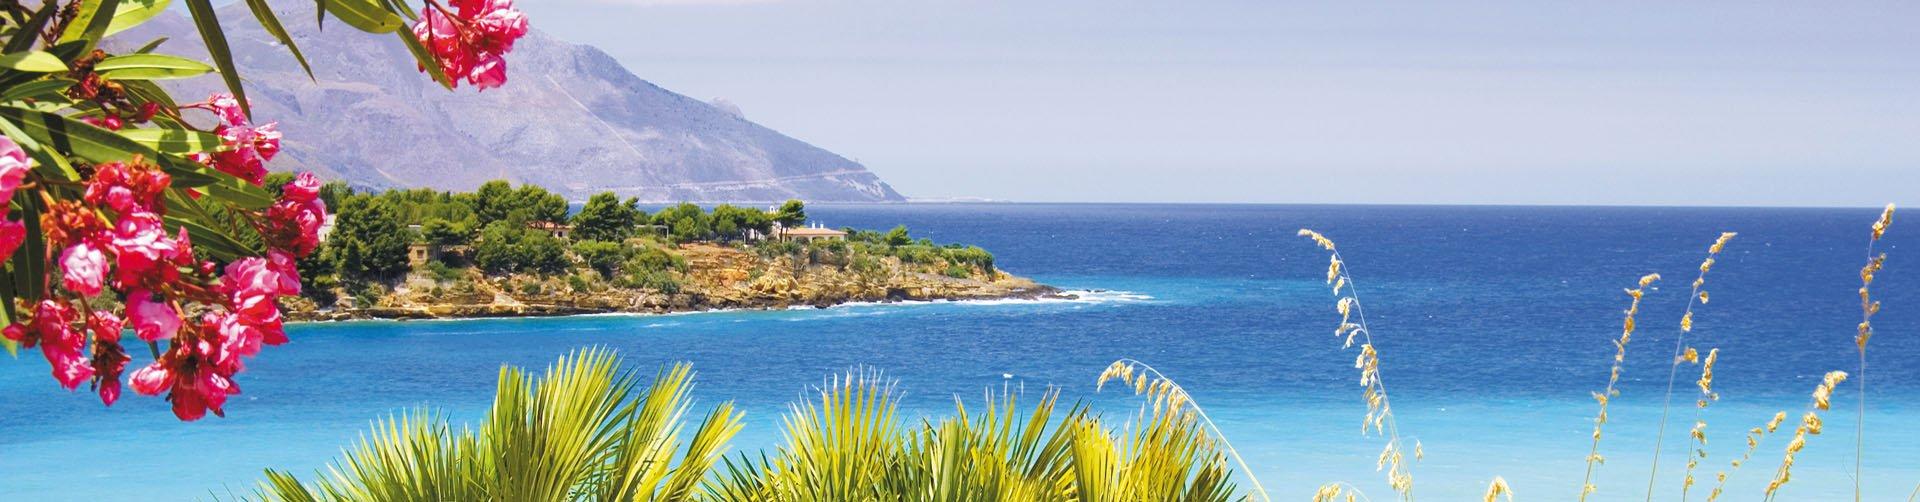 Italie - Sicilie